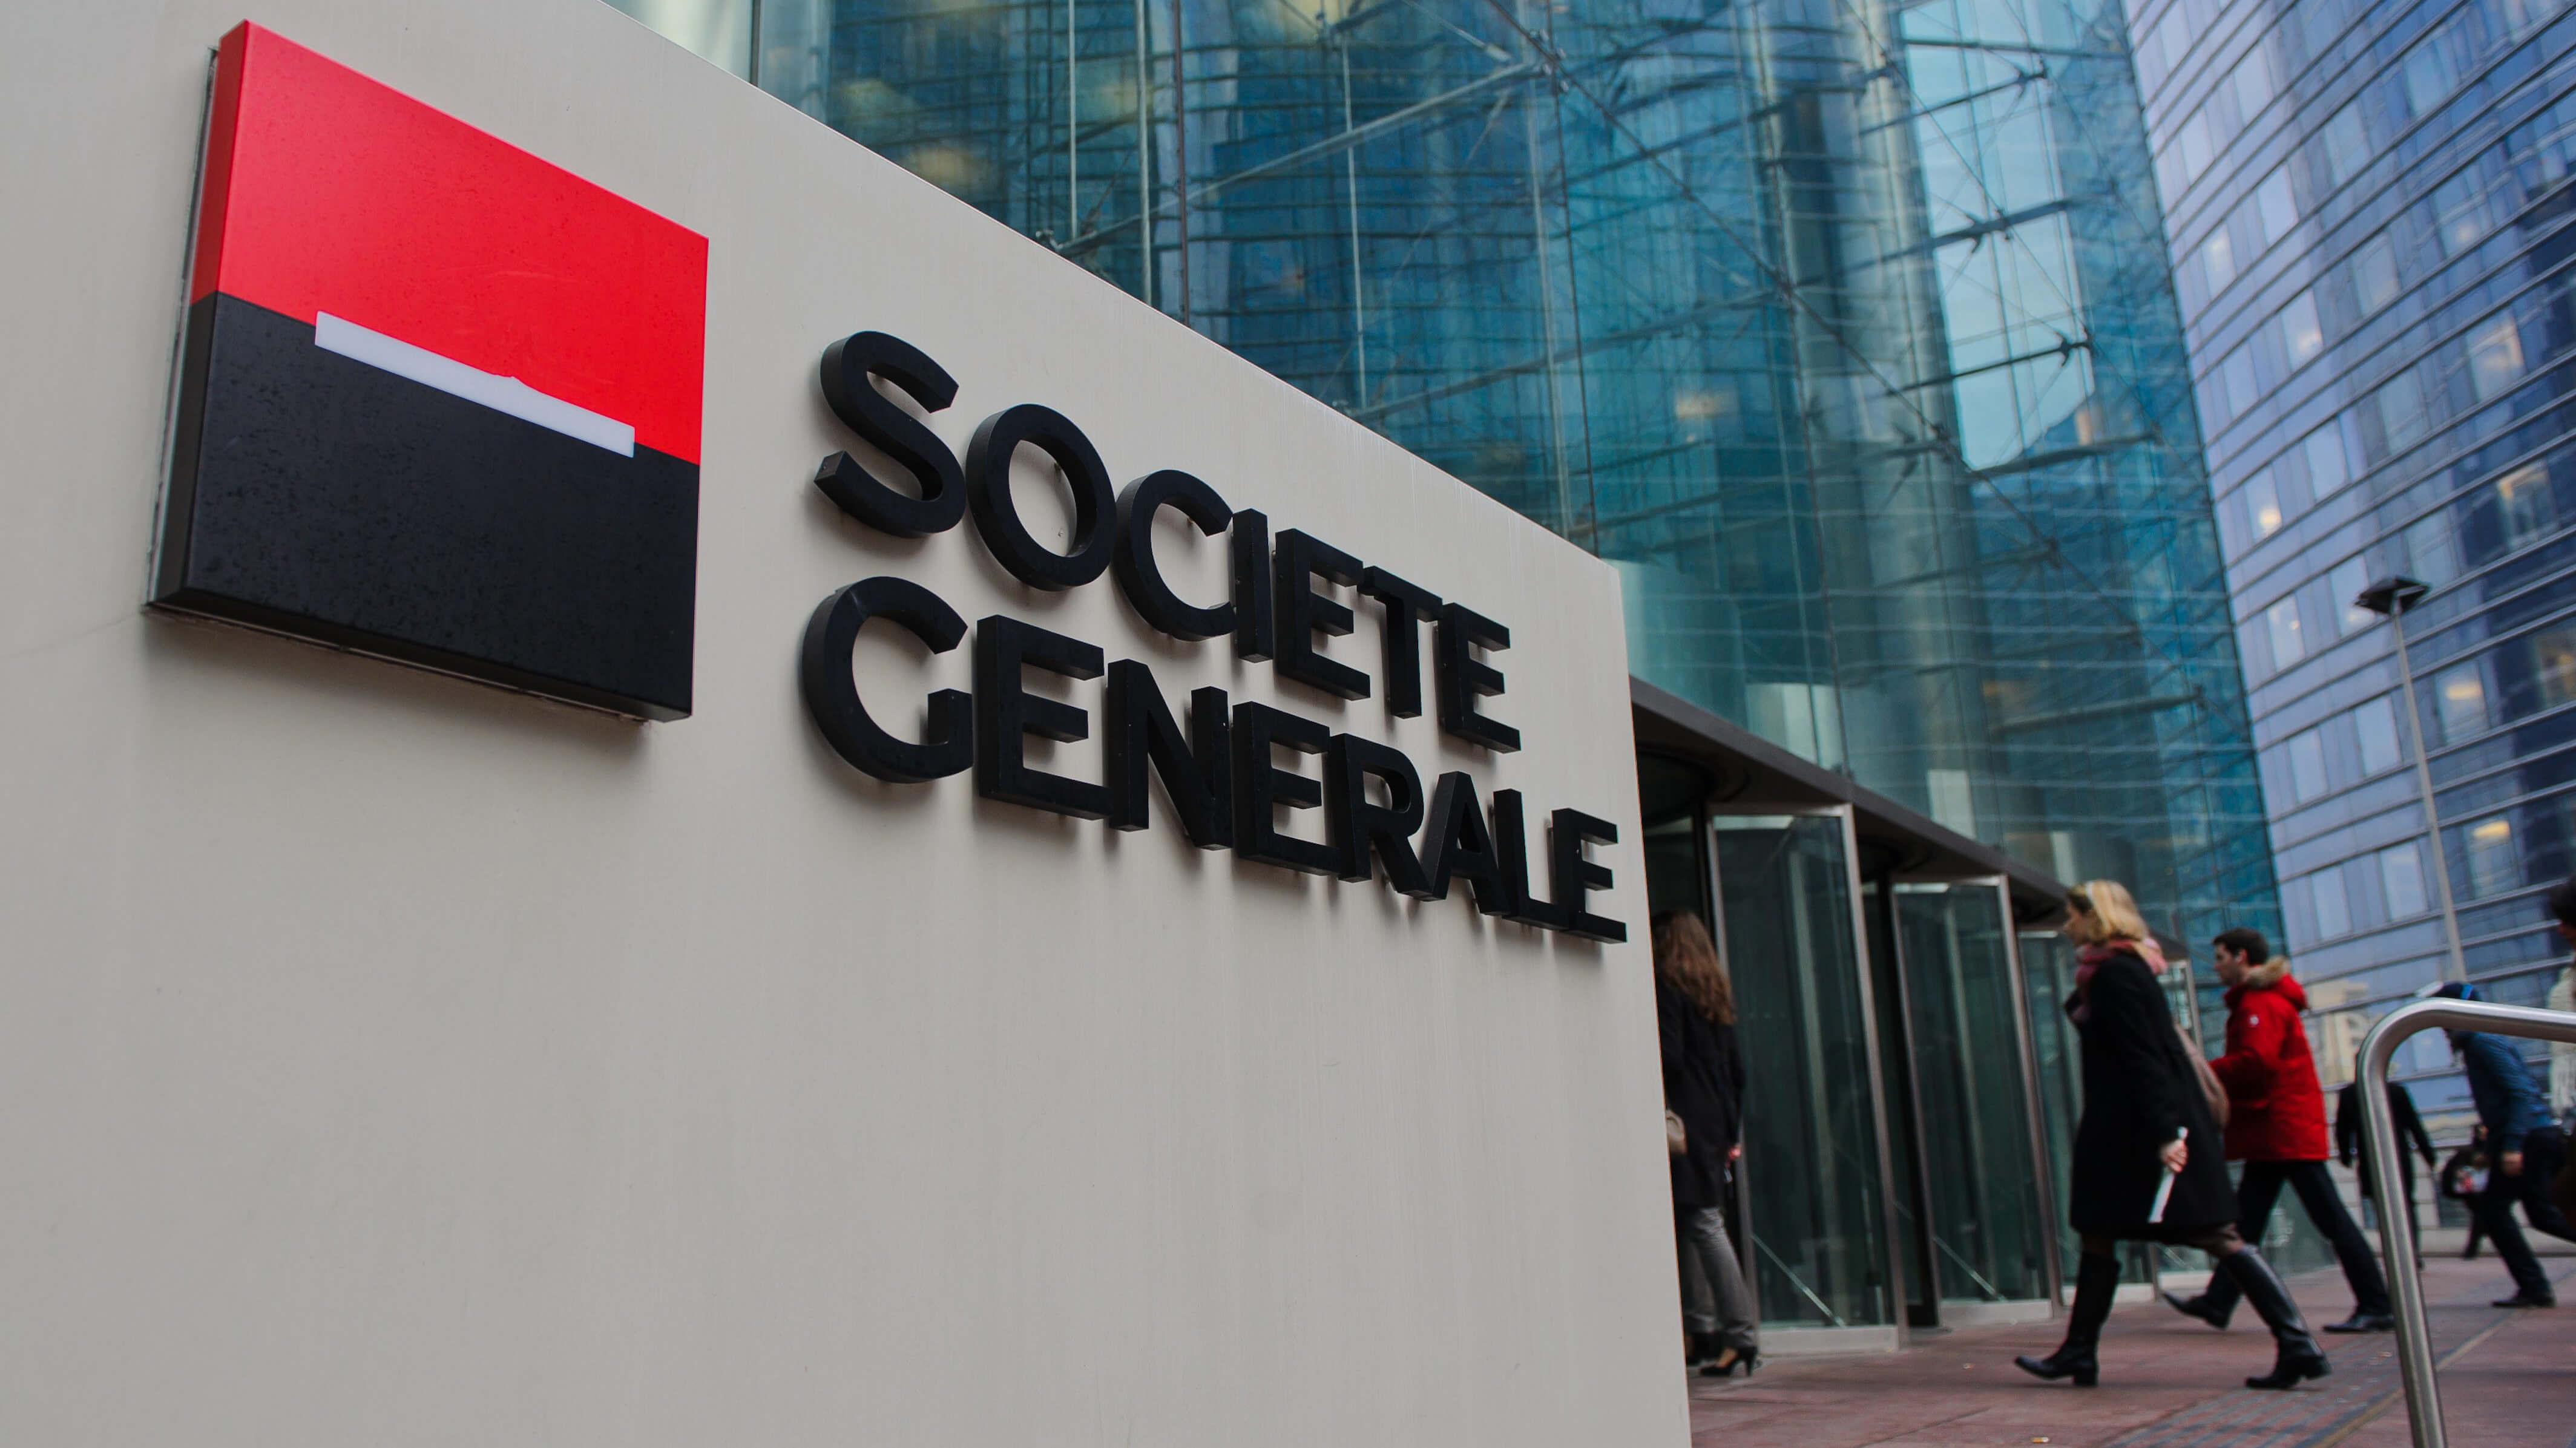 SOCIETE GENERALE FULL YEARS RESULTS 2011